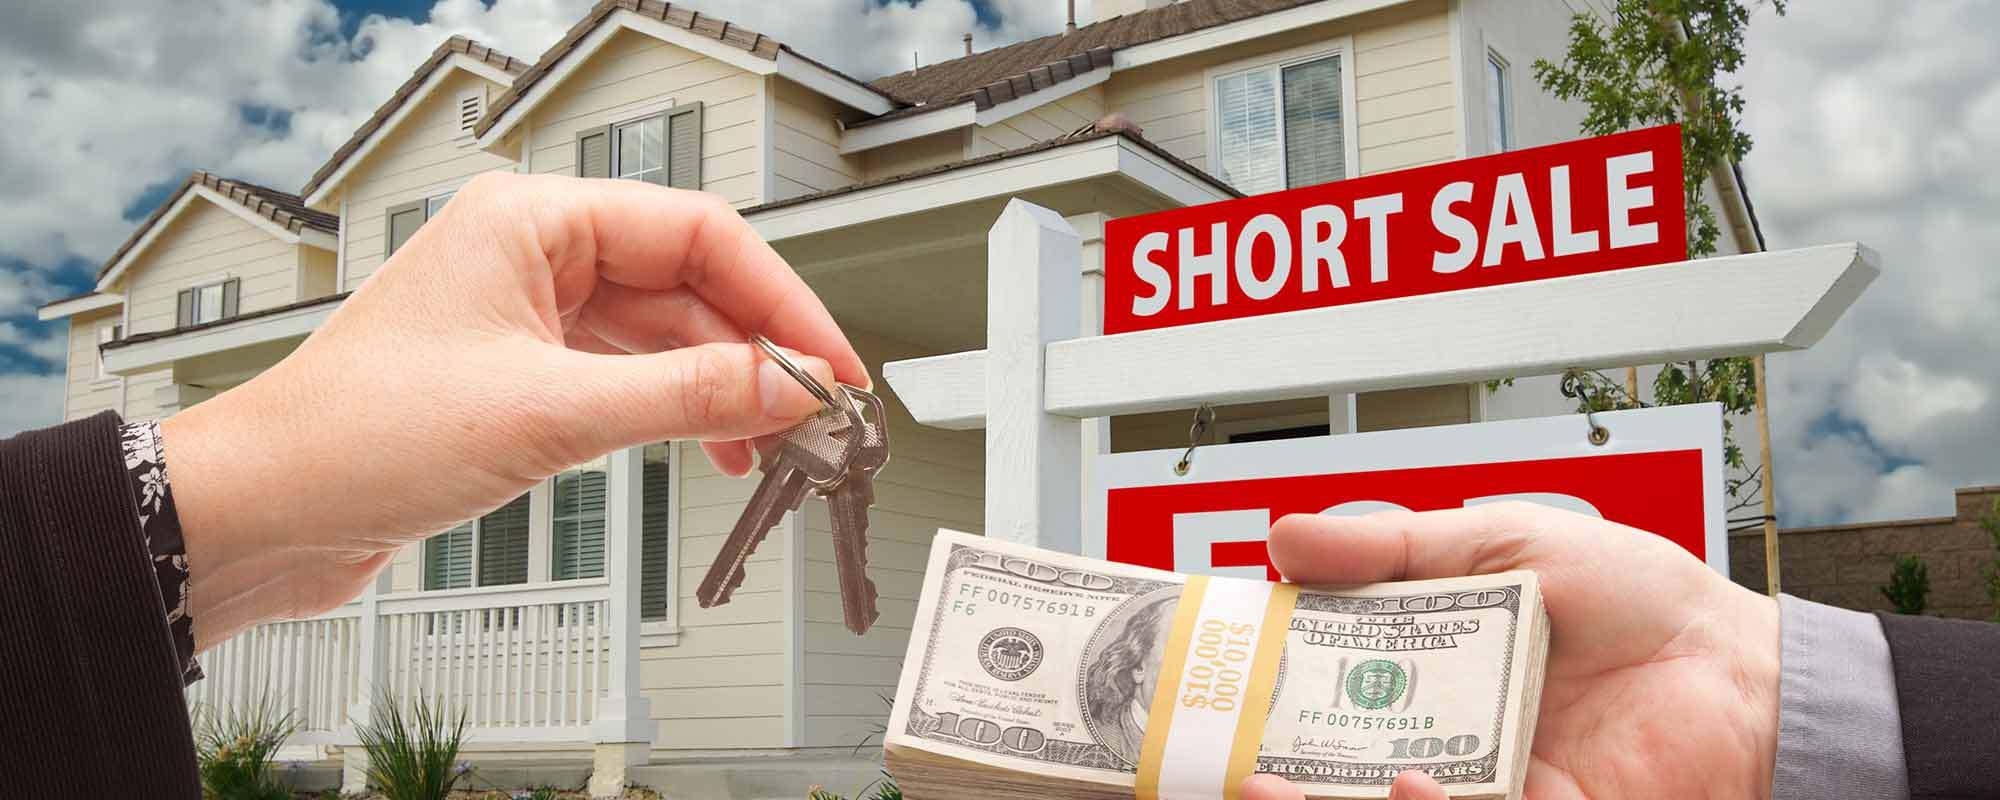 Cash Back deals available for property sale